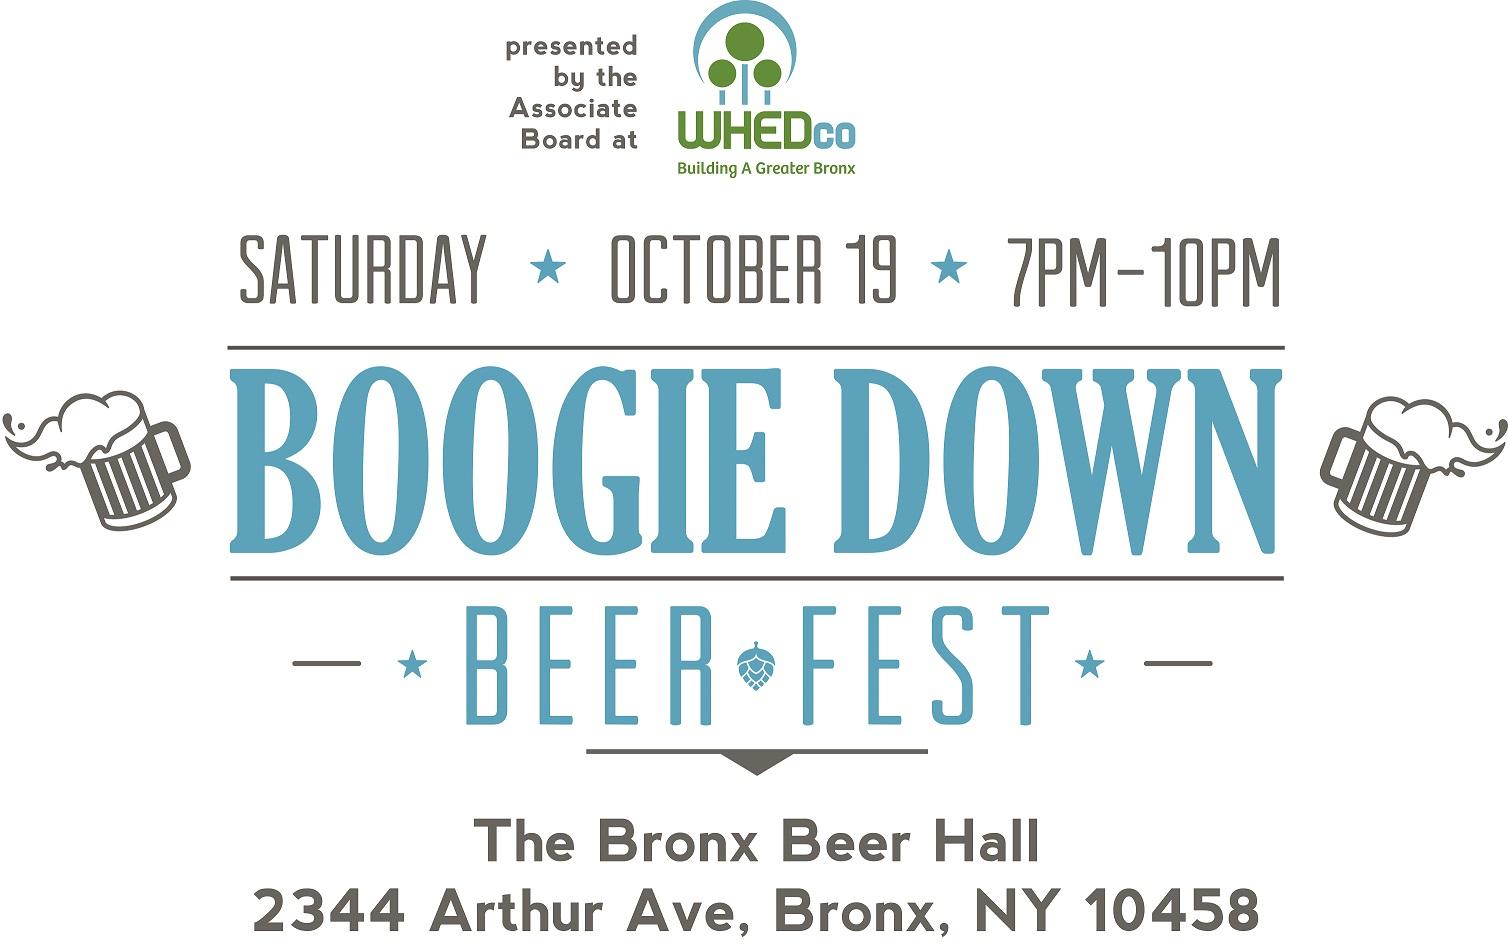 boogie down beer fest 2019 logo